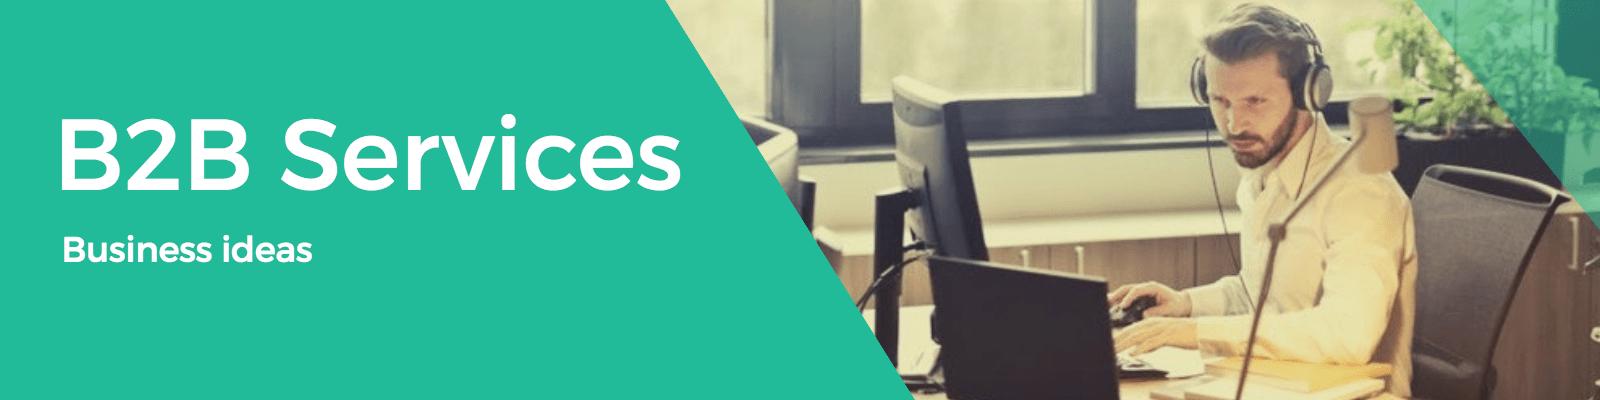 b2b services business ideas